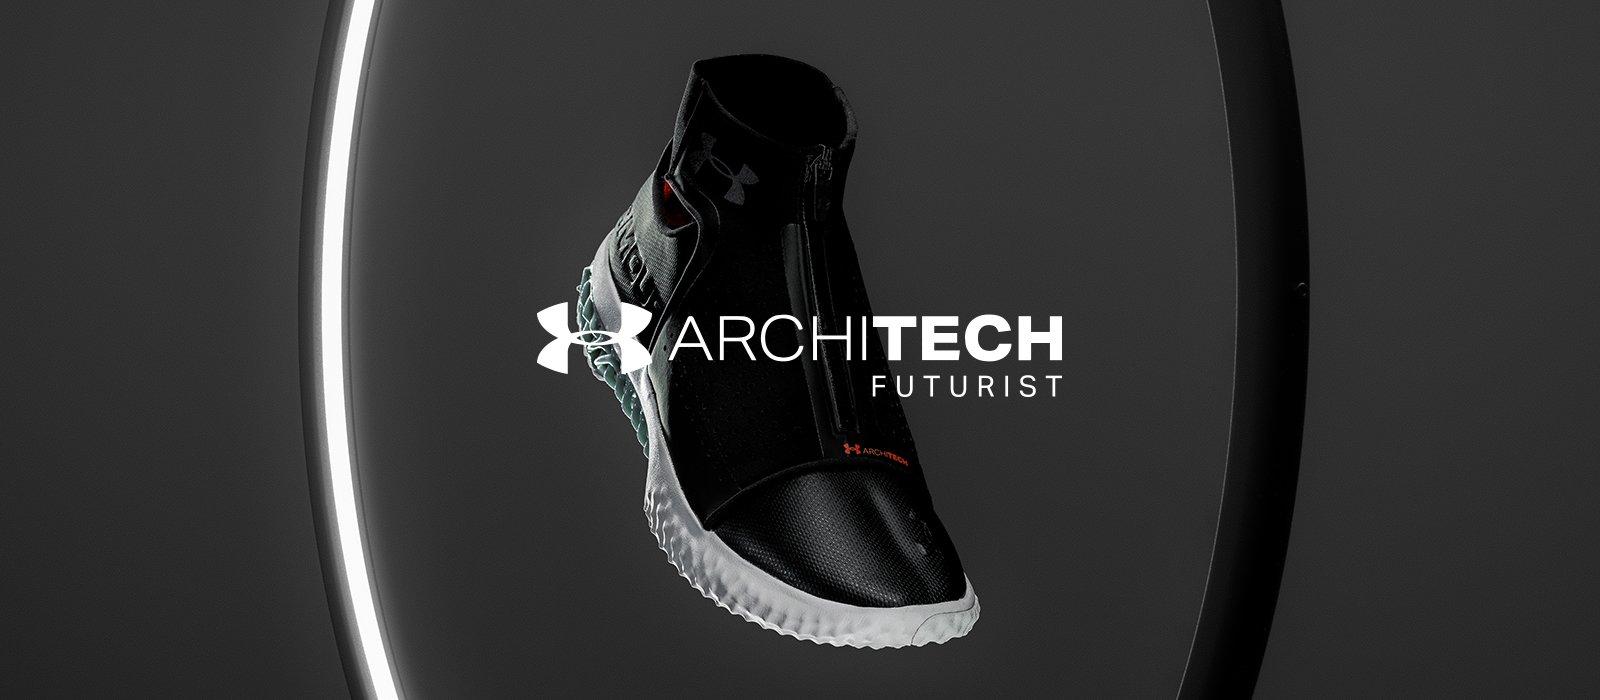 Under Armour's Architech Futurist sneaker.